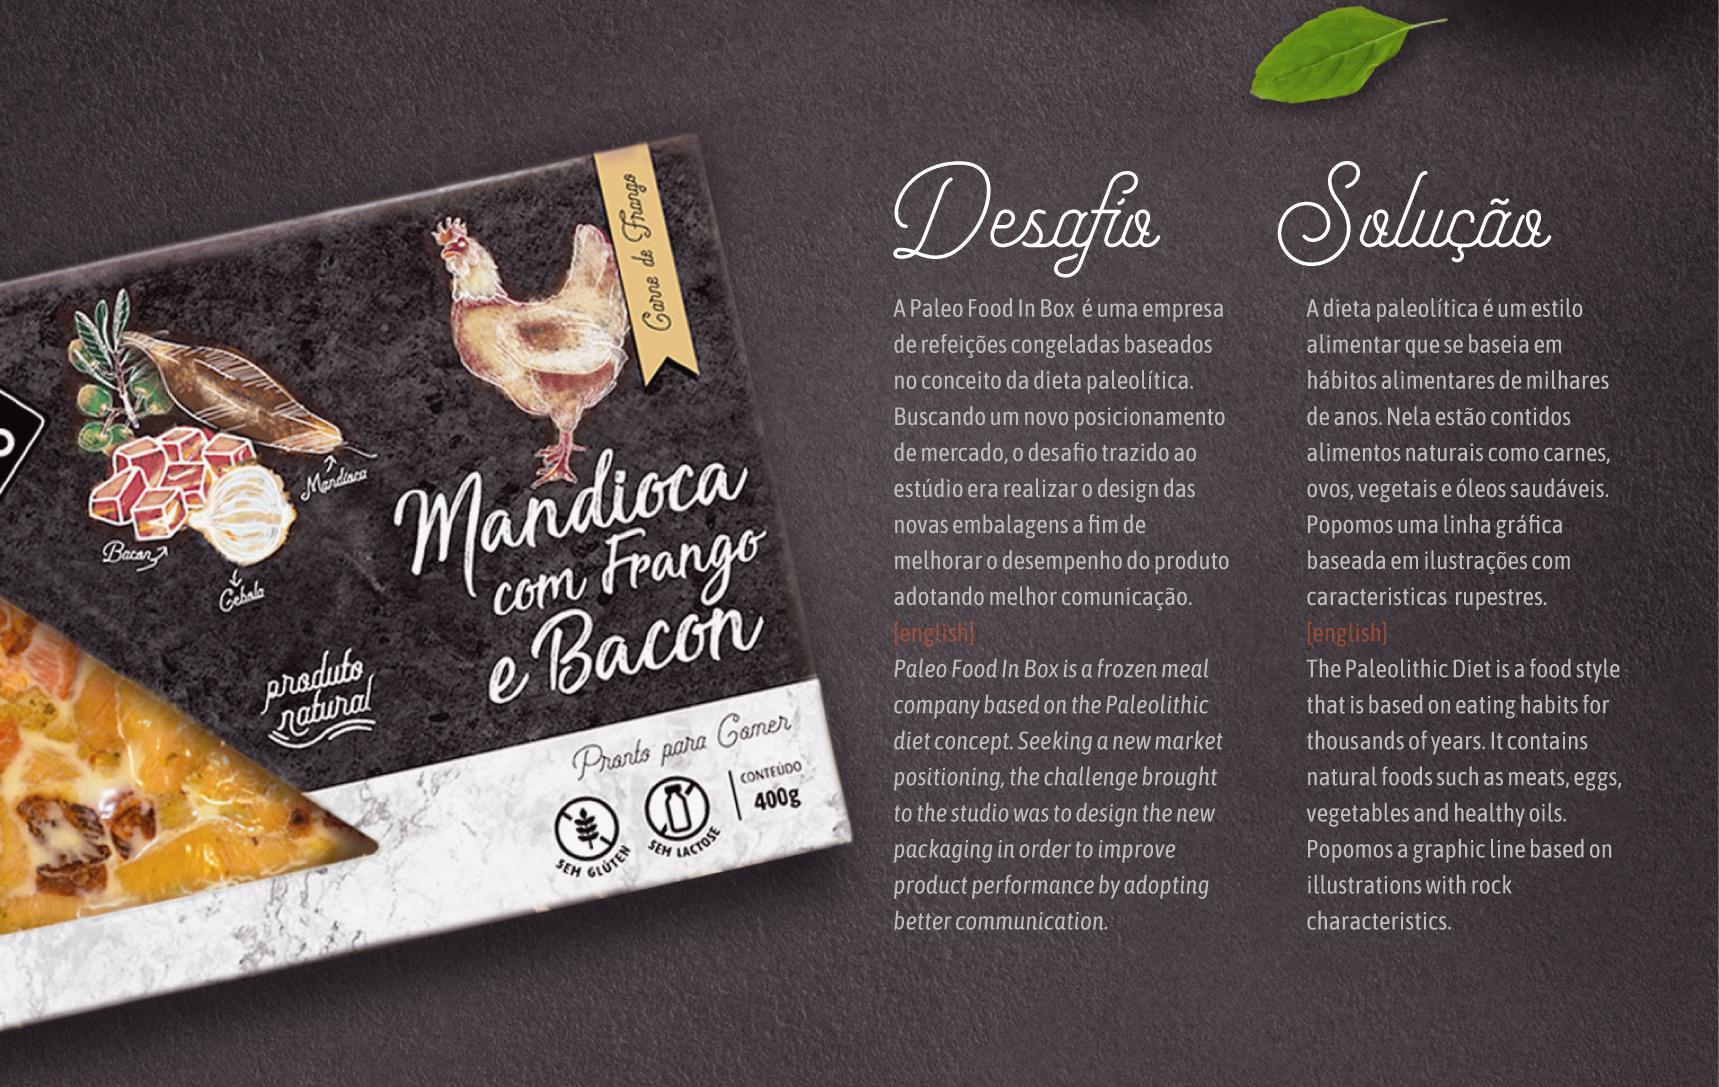 Design Embalagem Comida Congelada - Paleo Food